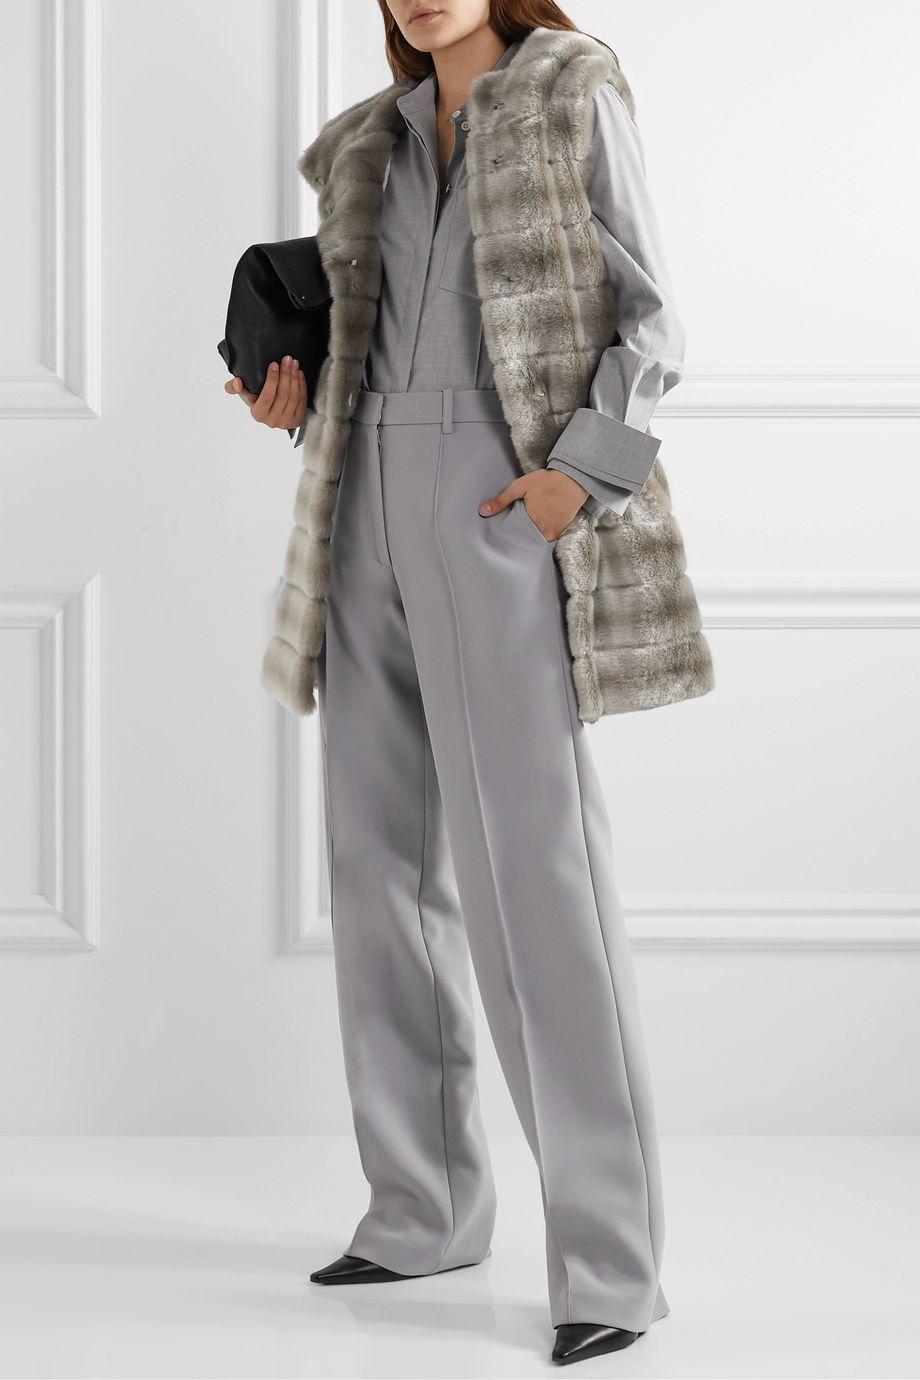 Faz Not Fur Oh My Deer hooded faux fur vest